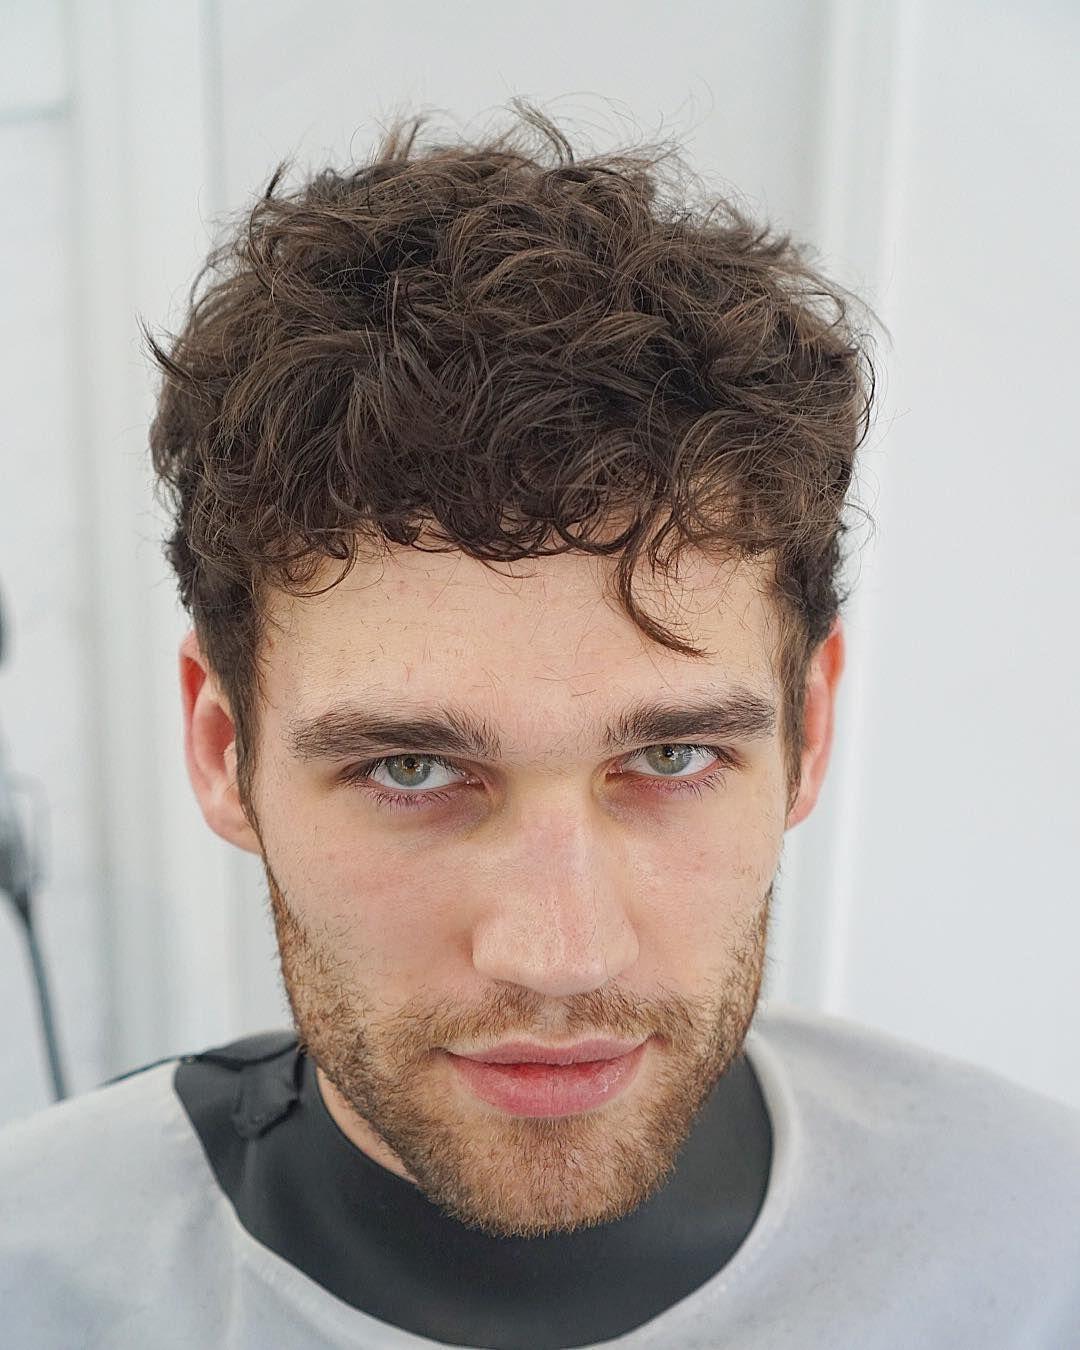 20 Medium Length Men S Haircuts 2020 Styles Curly Hair Men Medium Length Mens Haircuts Medium Length Curly Hair